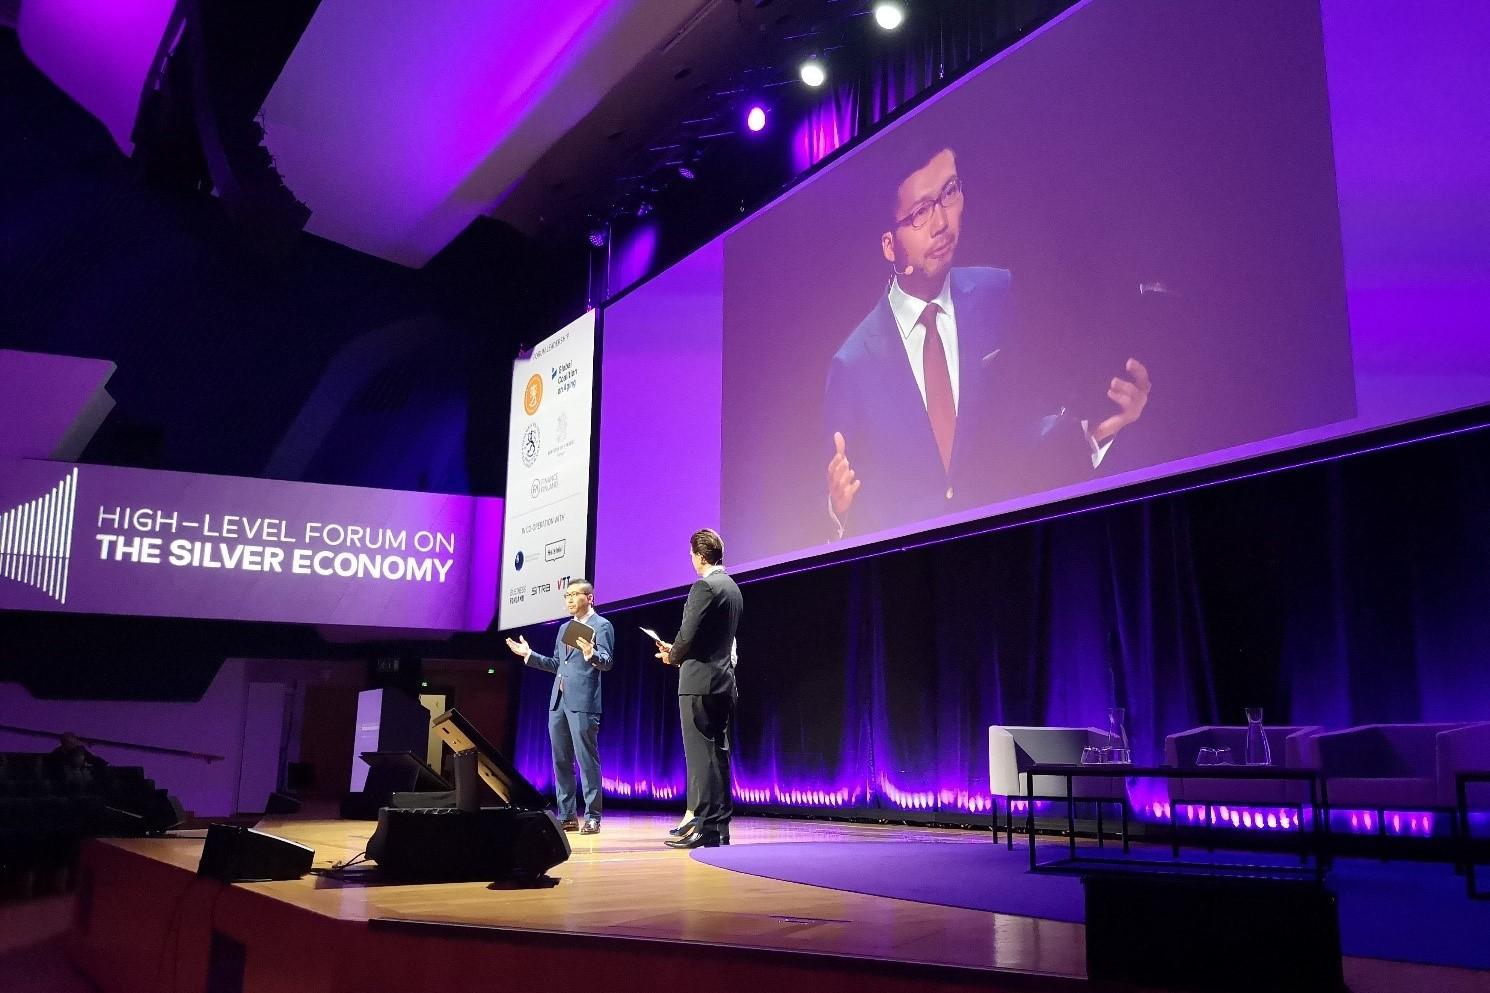 [Presentation] High-Level Forum on the Silver Economy (July 9 – 10, 2019, Helsinki, Finland)